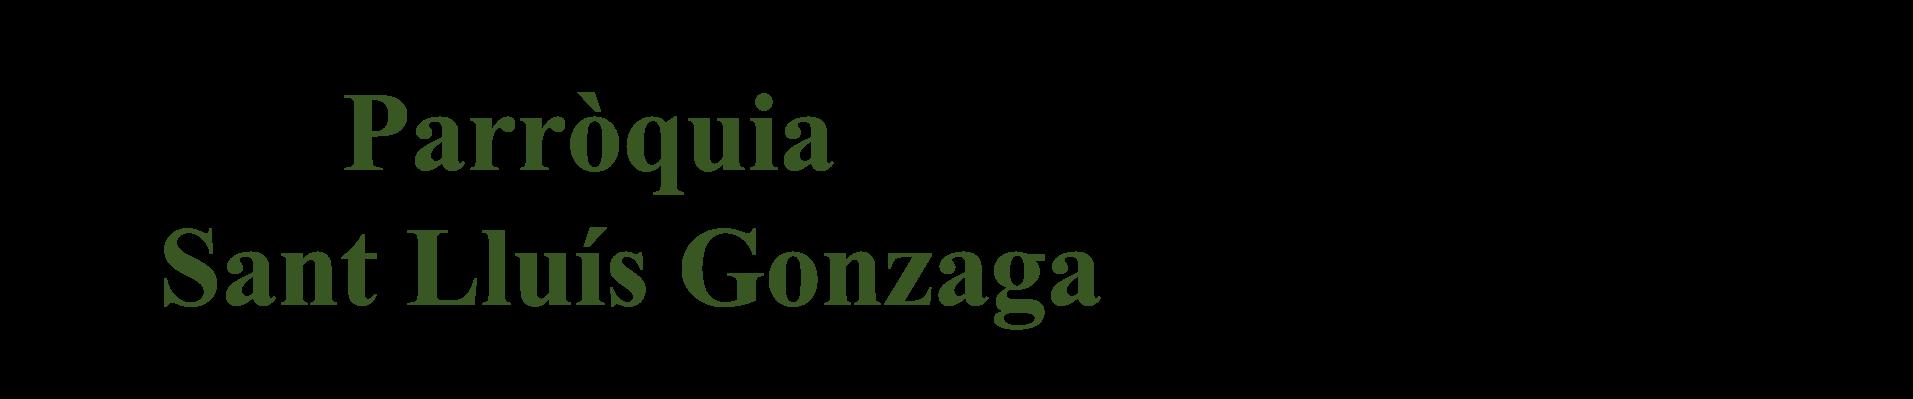 Parròquia Sant Lluís Gonzaga